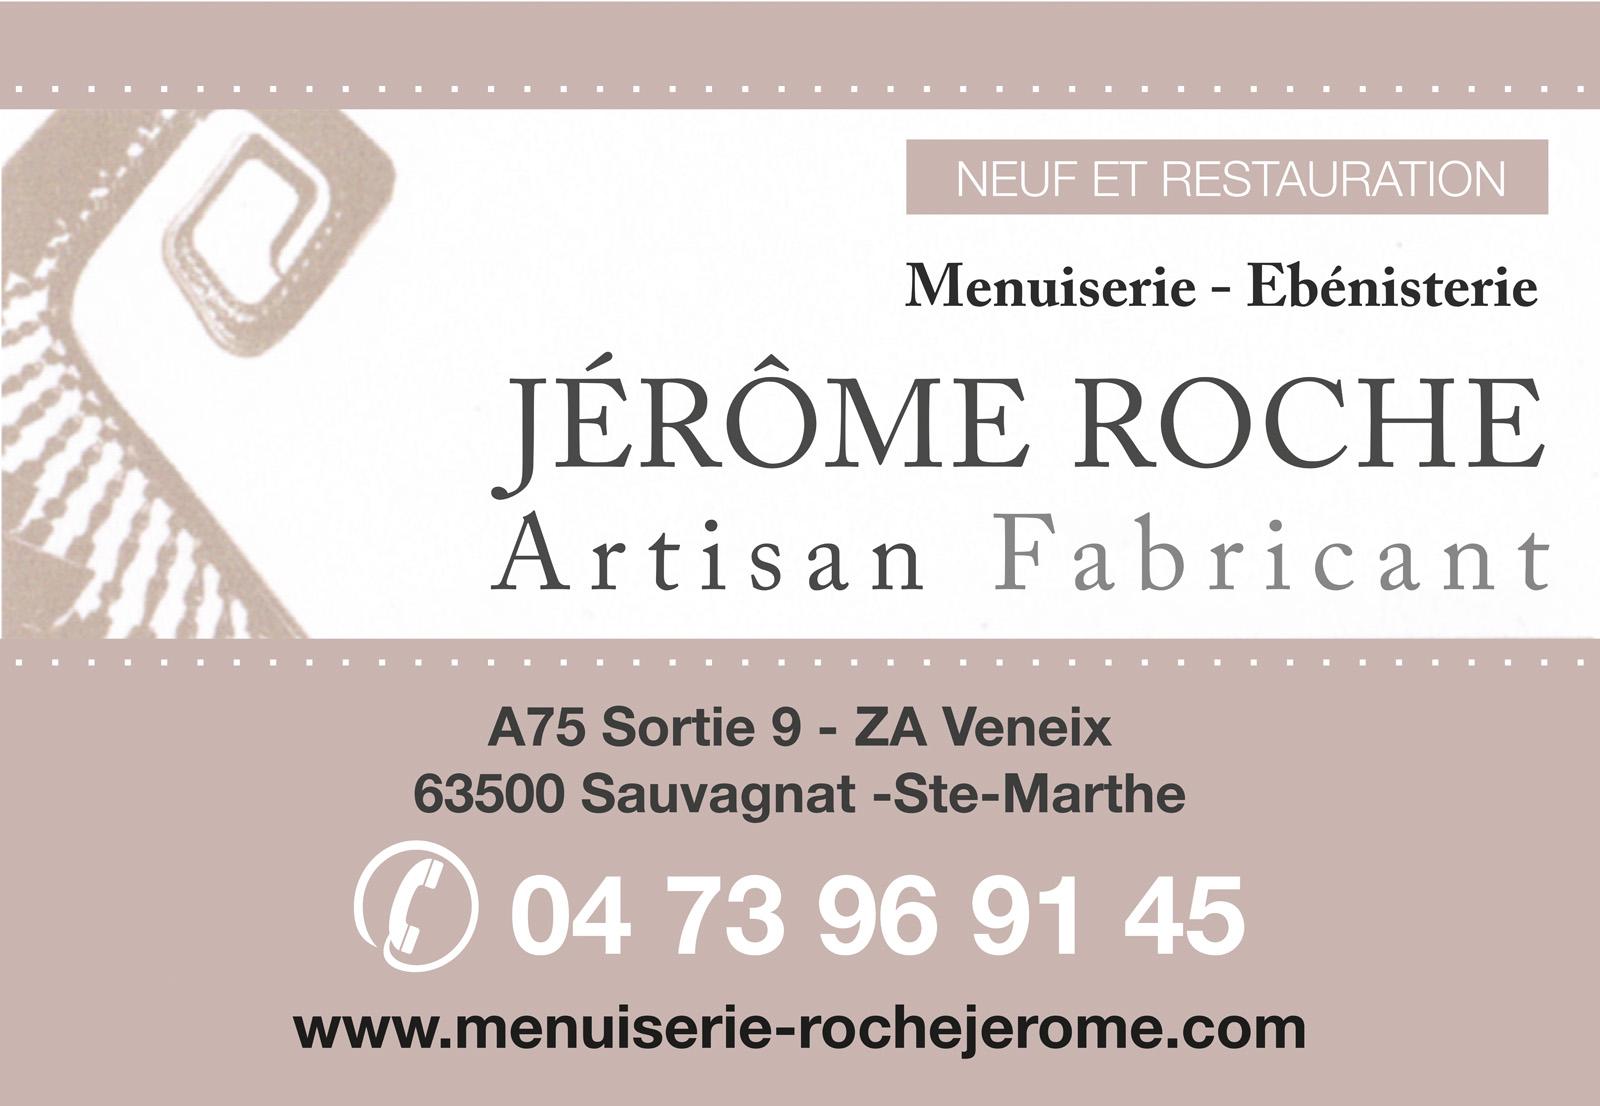 logo Menuiserie - Jêrome Roche Artisan Fabricant